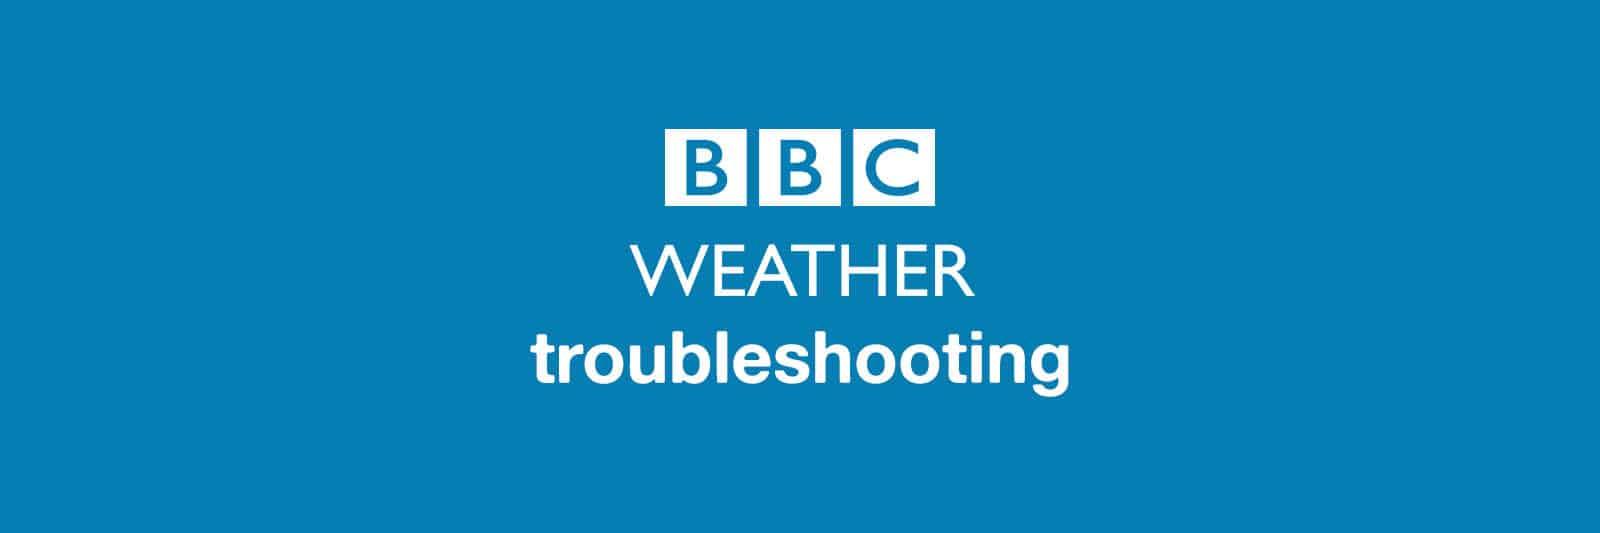 bbc-weather-troubleshooting